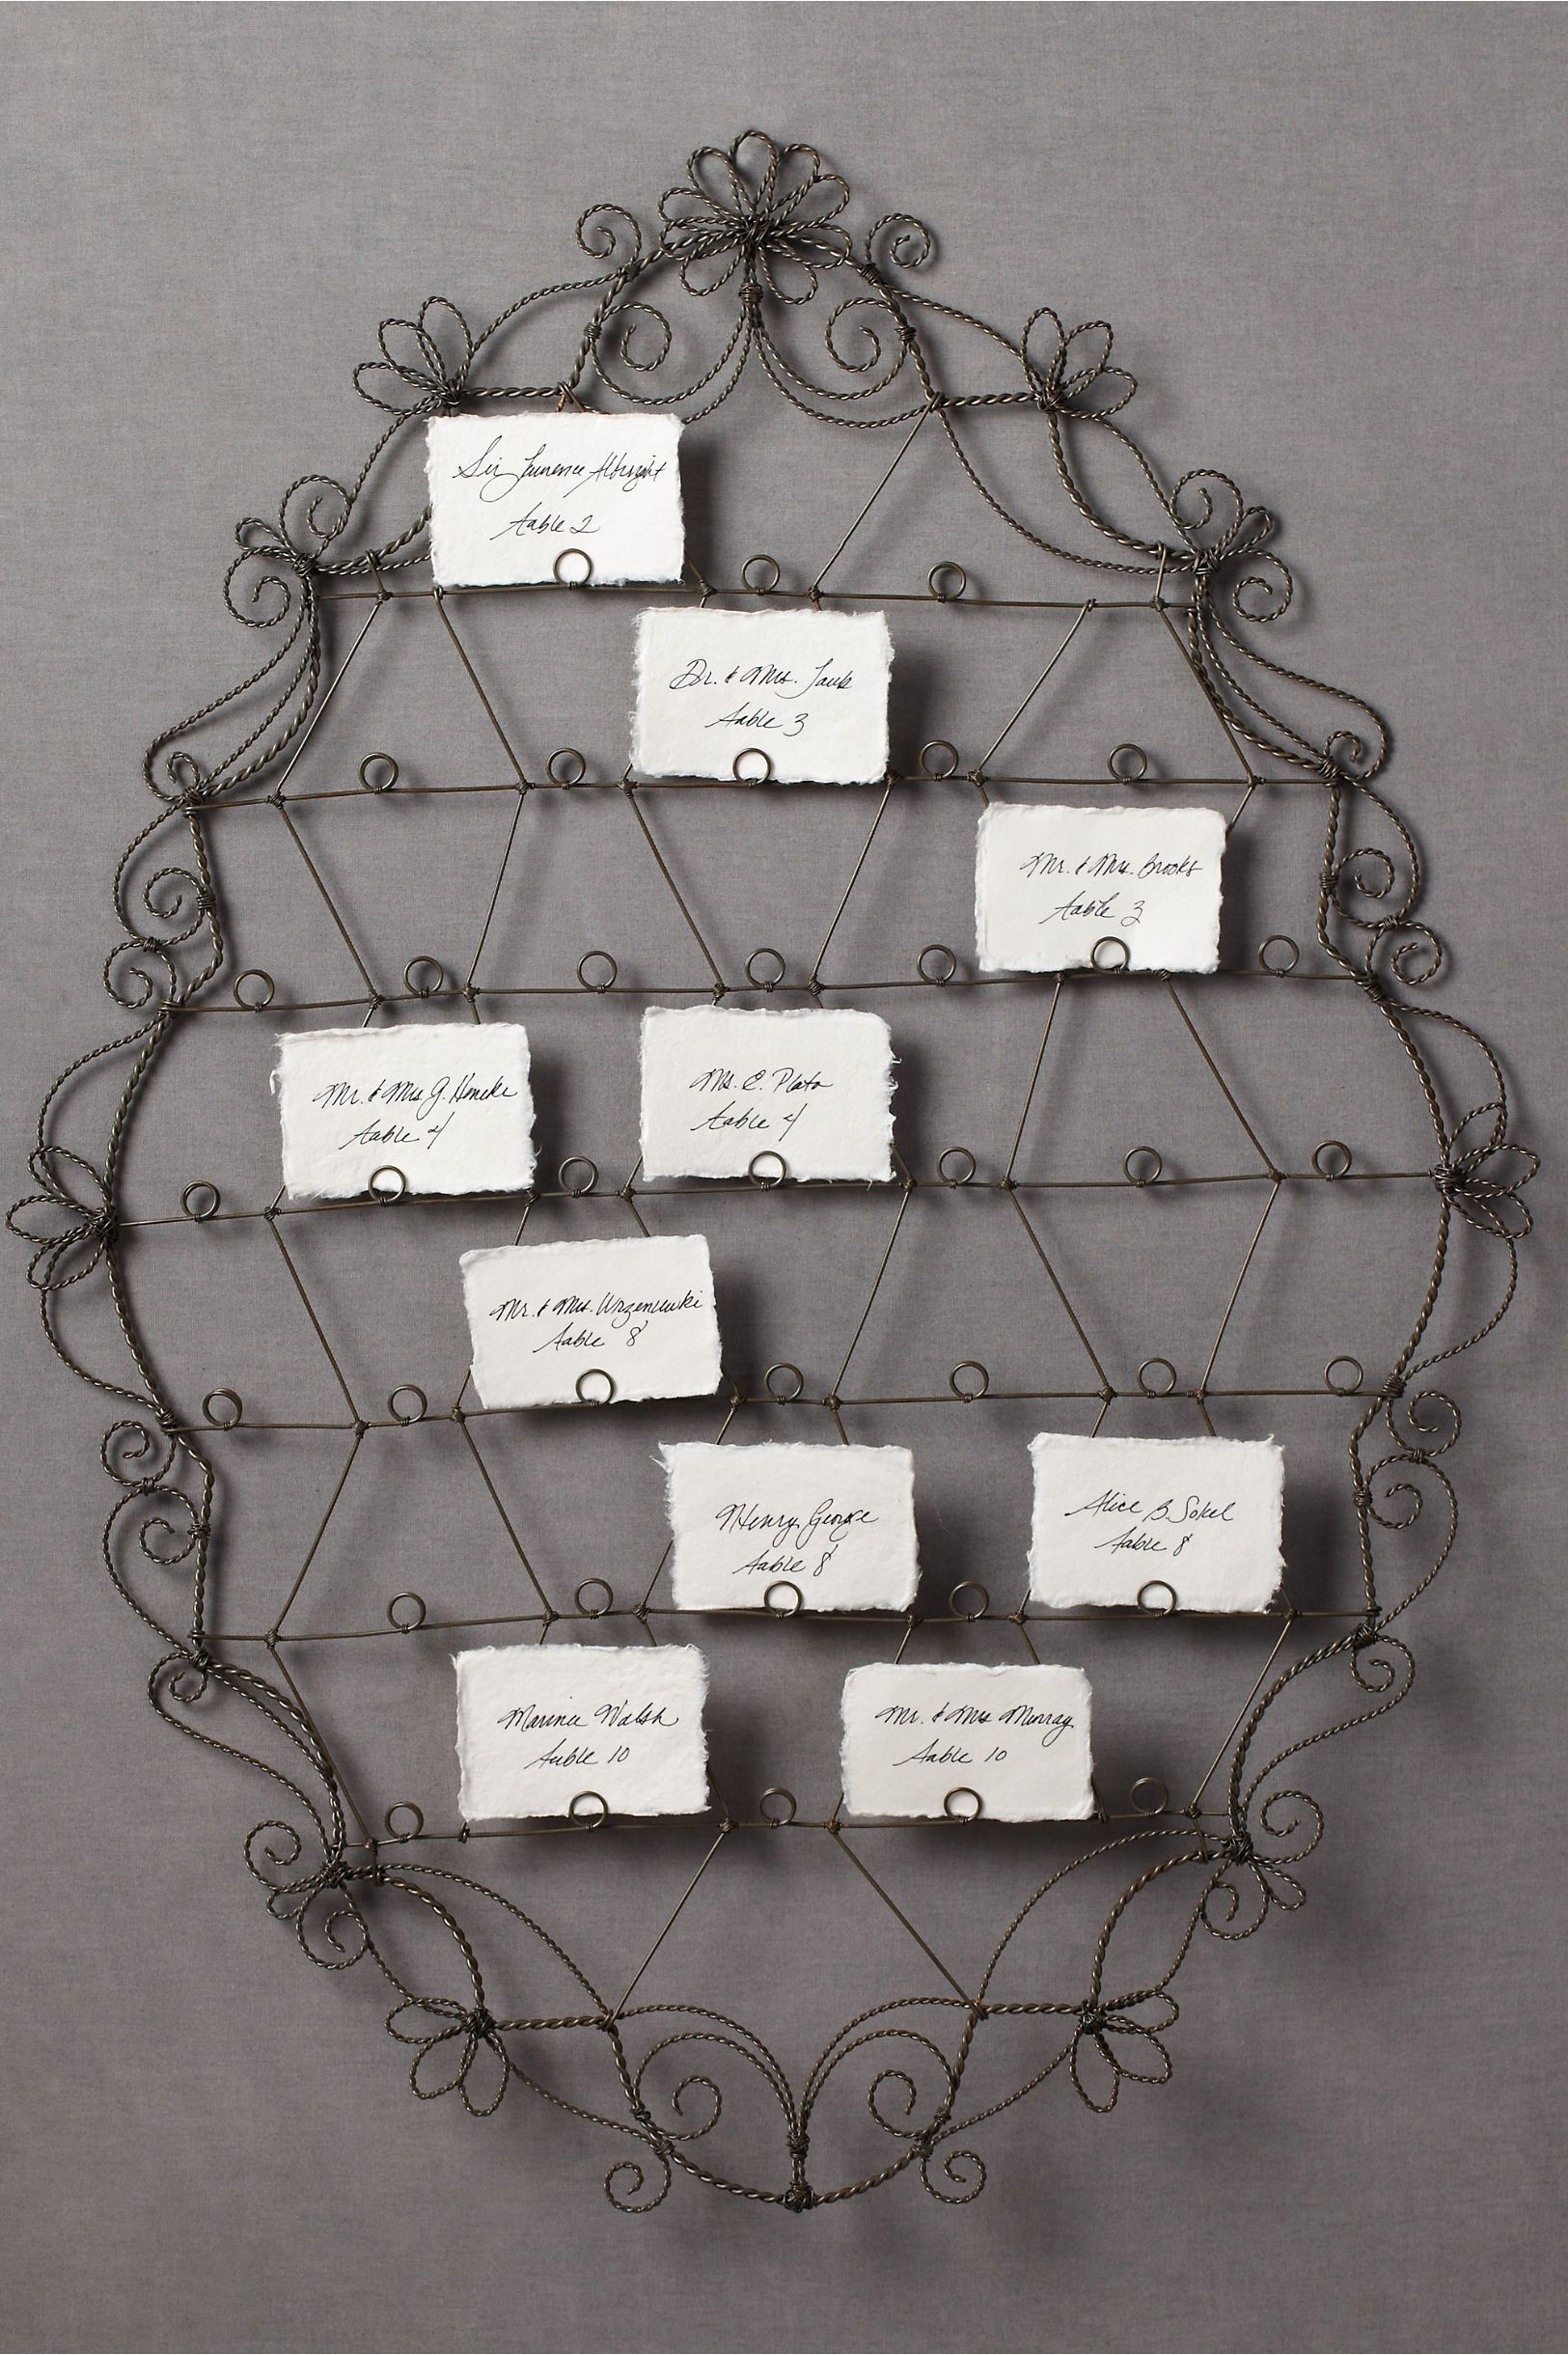 Me gusta como marco d foto en la pared | Hierro | Pinterest ...